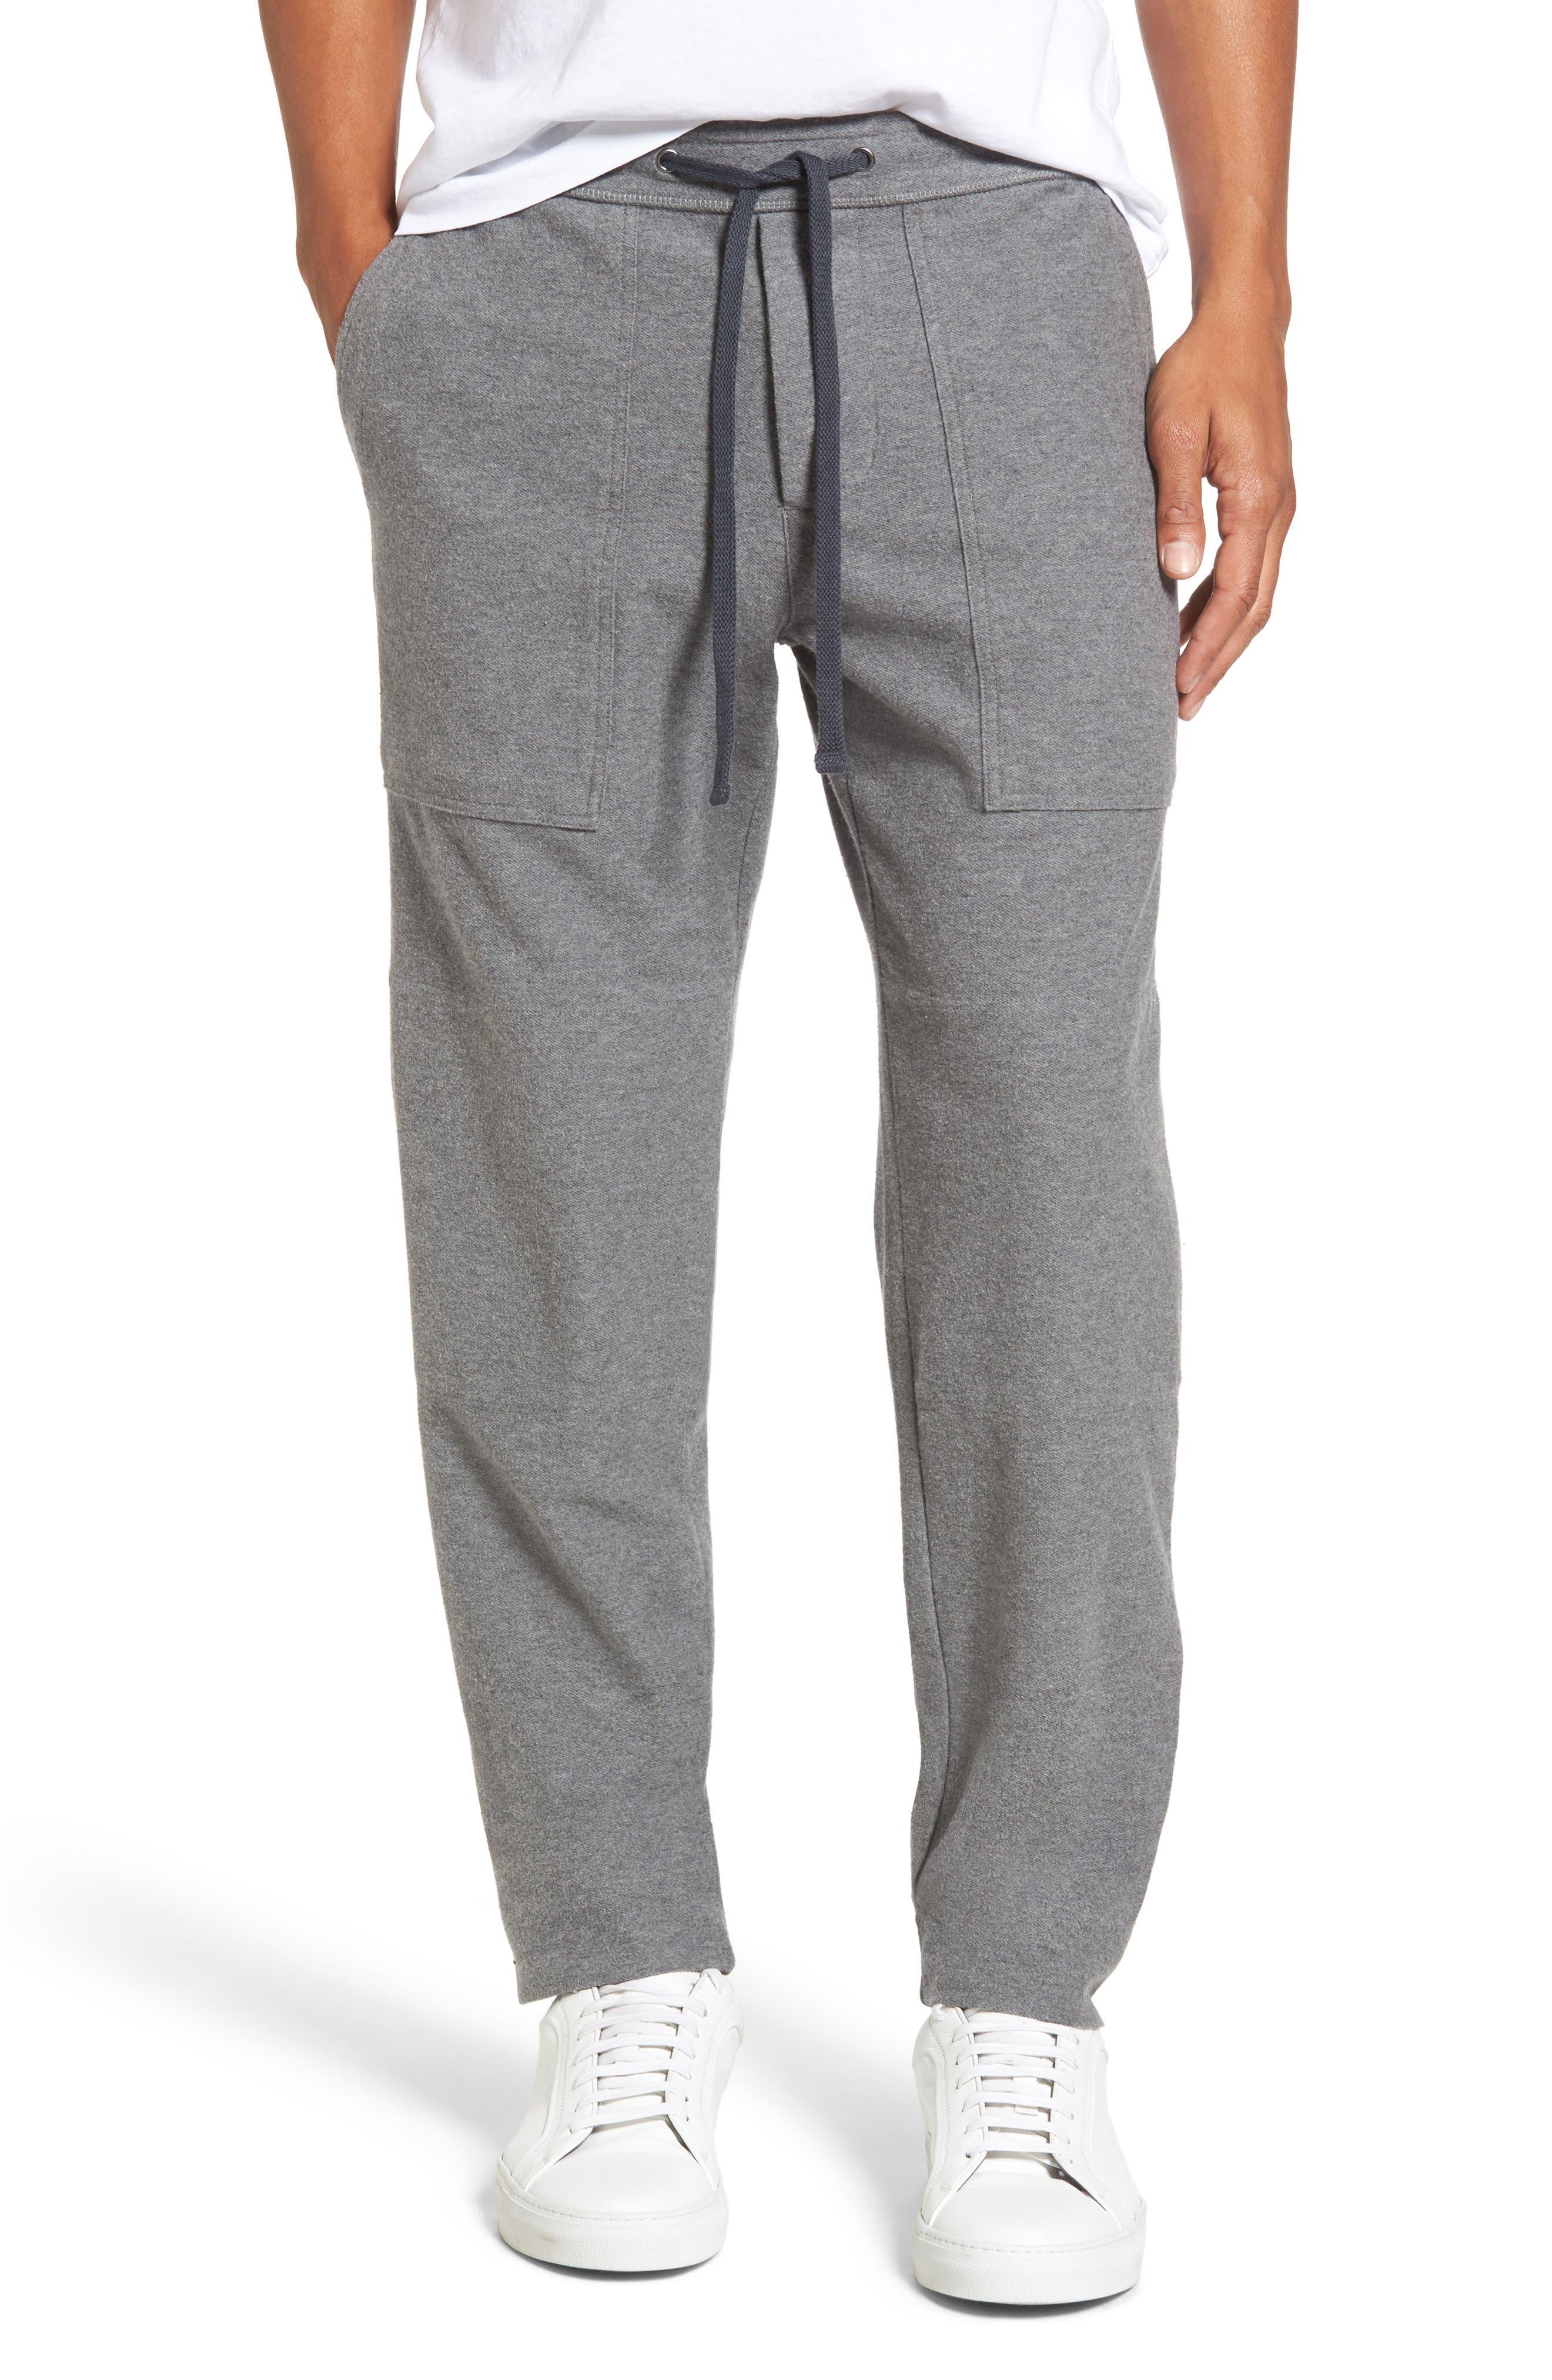 Heathered Knit Lounge Pants,                             Main thumbnail 1, color,                             Heather Grey